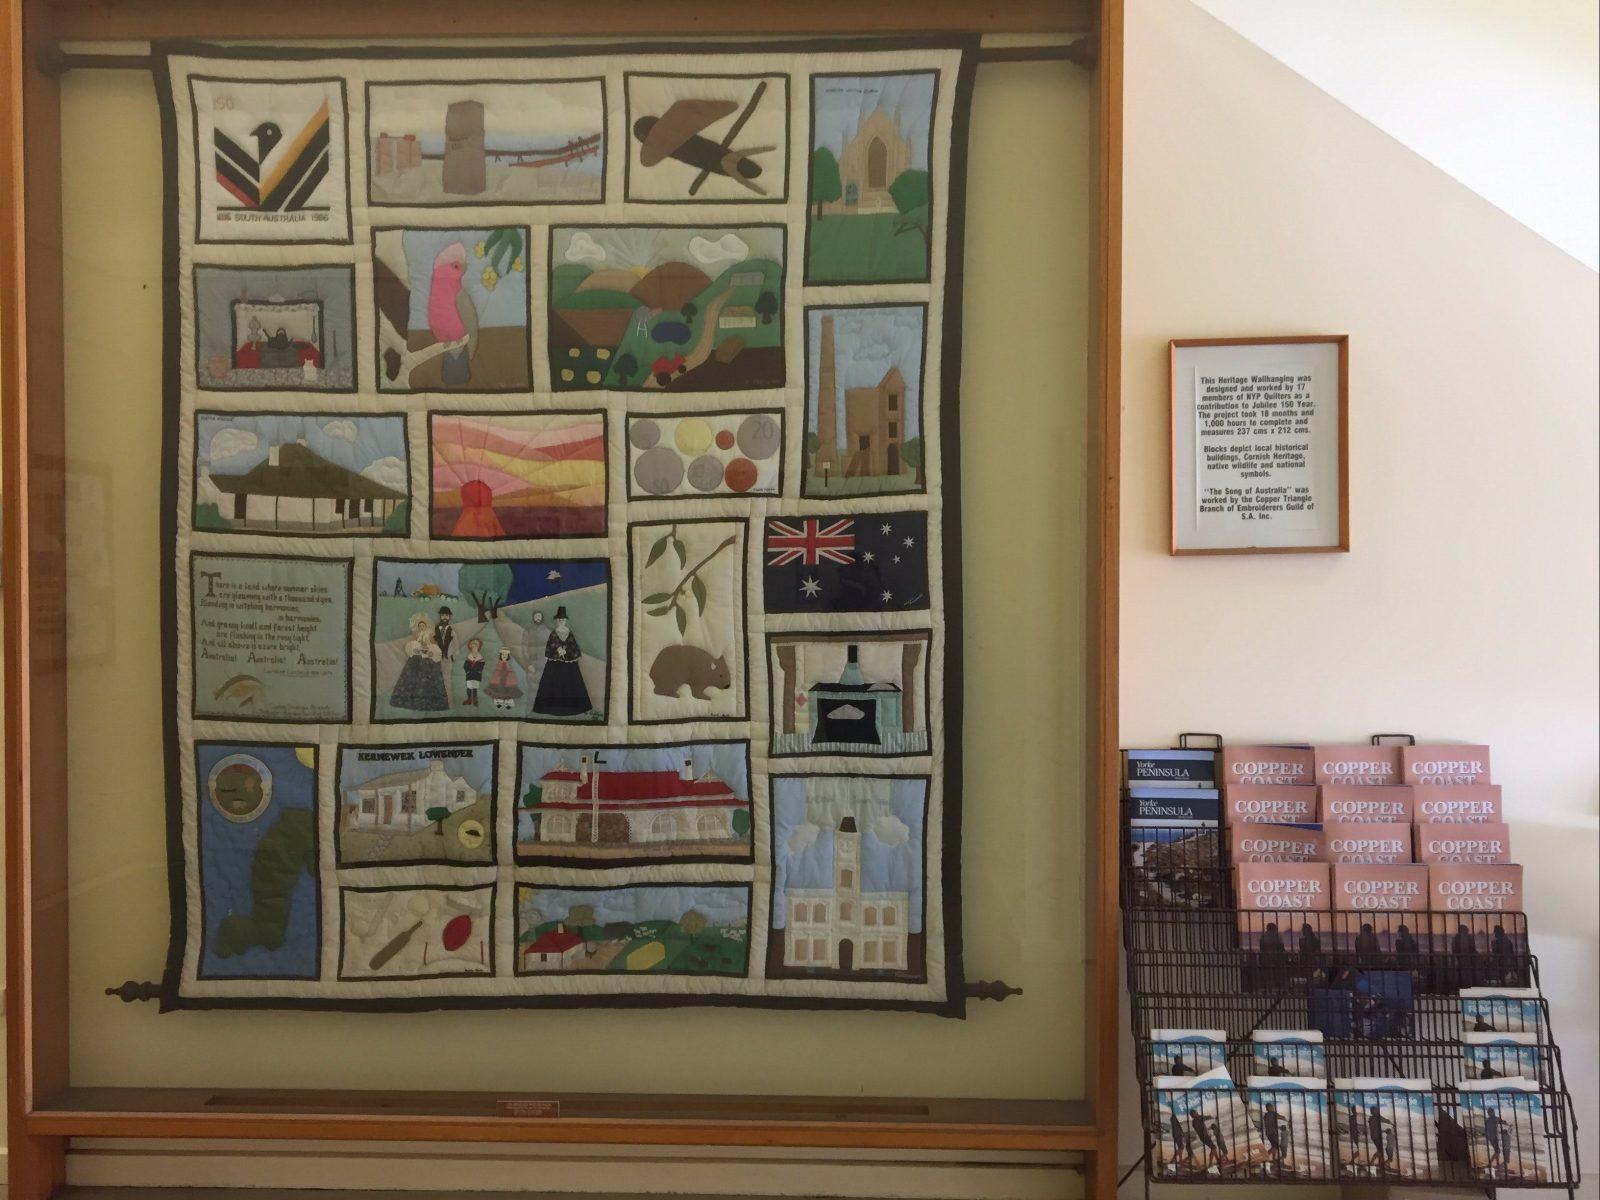 The Ascot Art Gallery